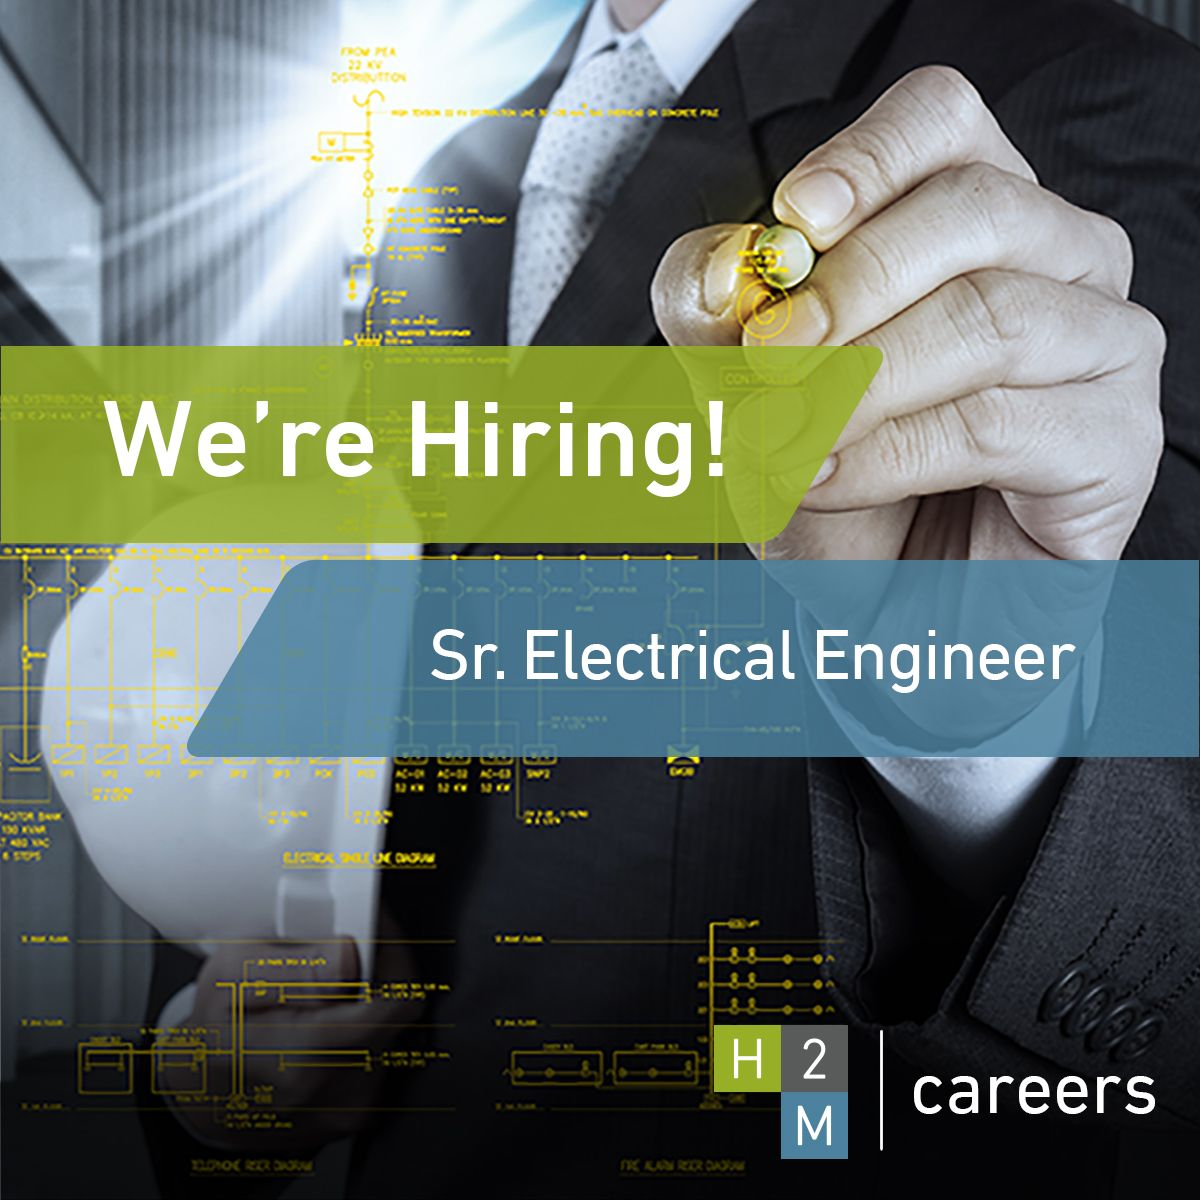 We're Hiring! Senior Electrical Engineer with 6+ years of